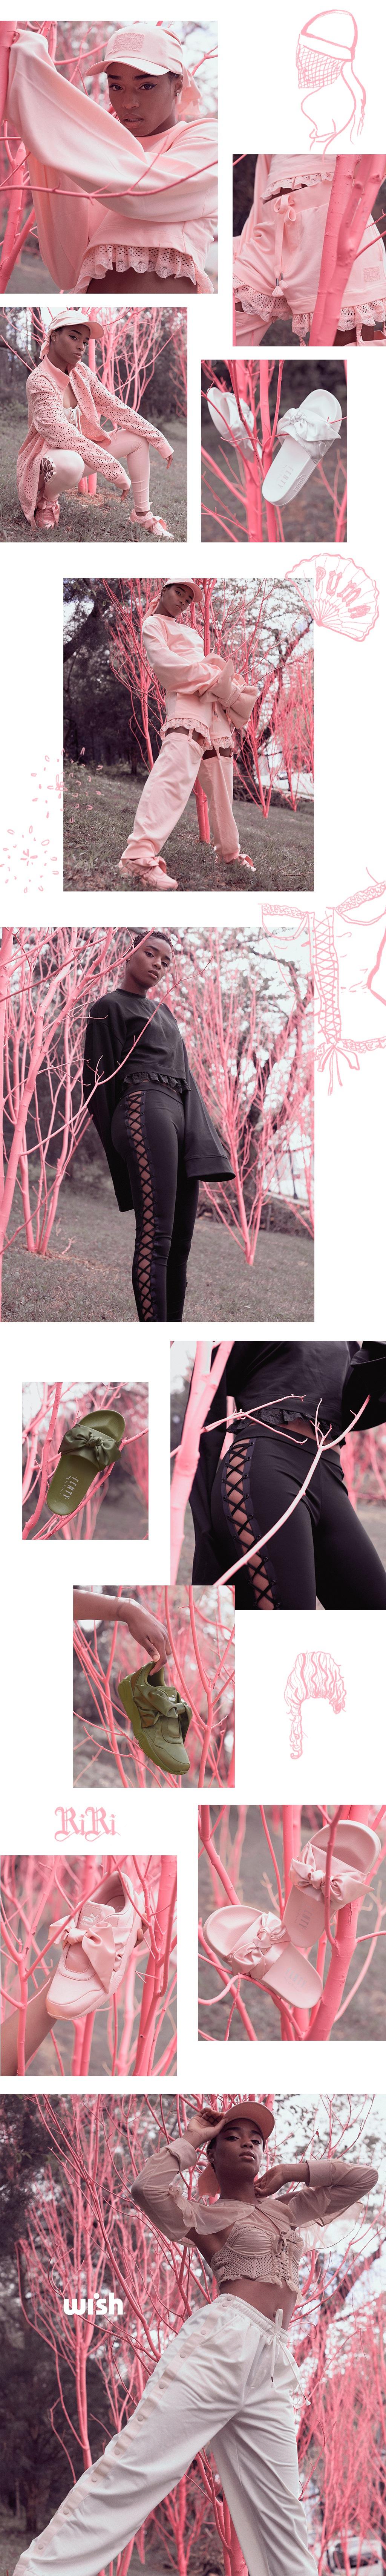 Fenty Puma x Rihanna SS17